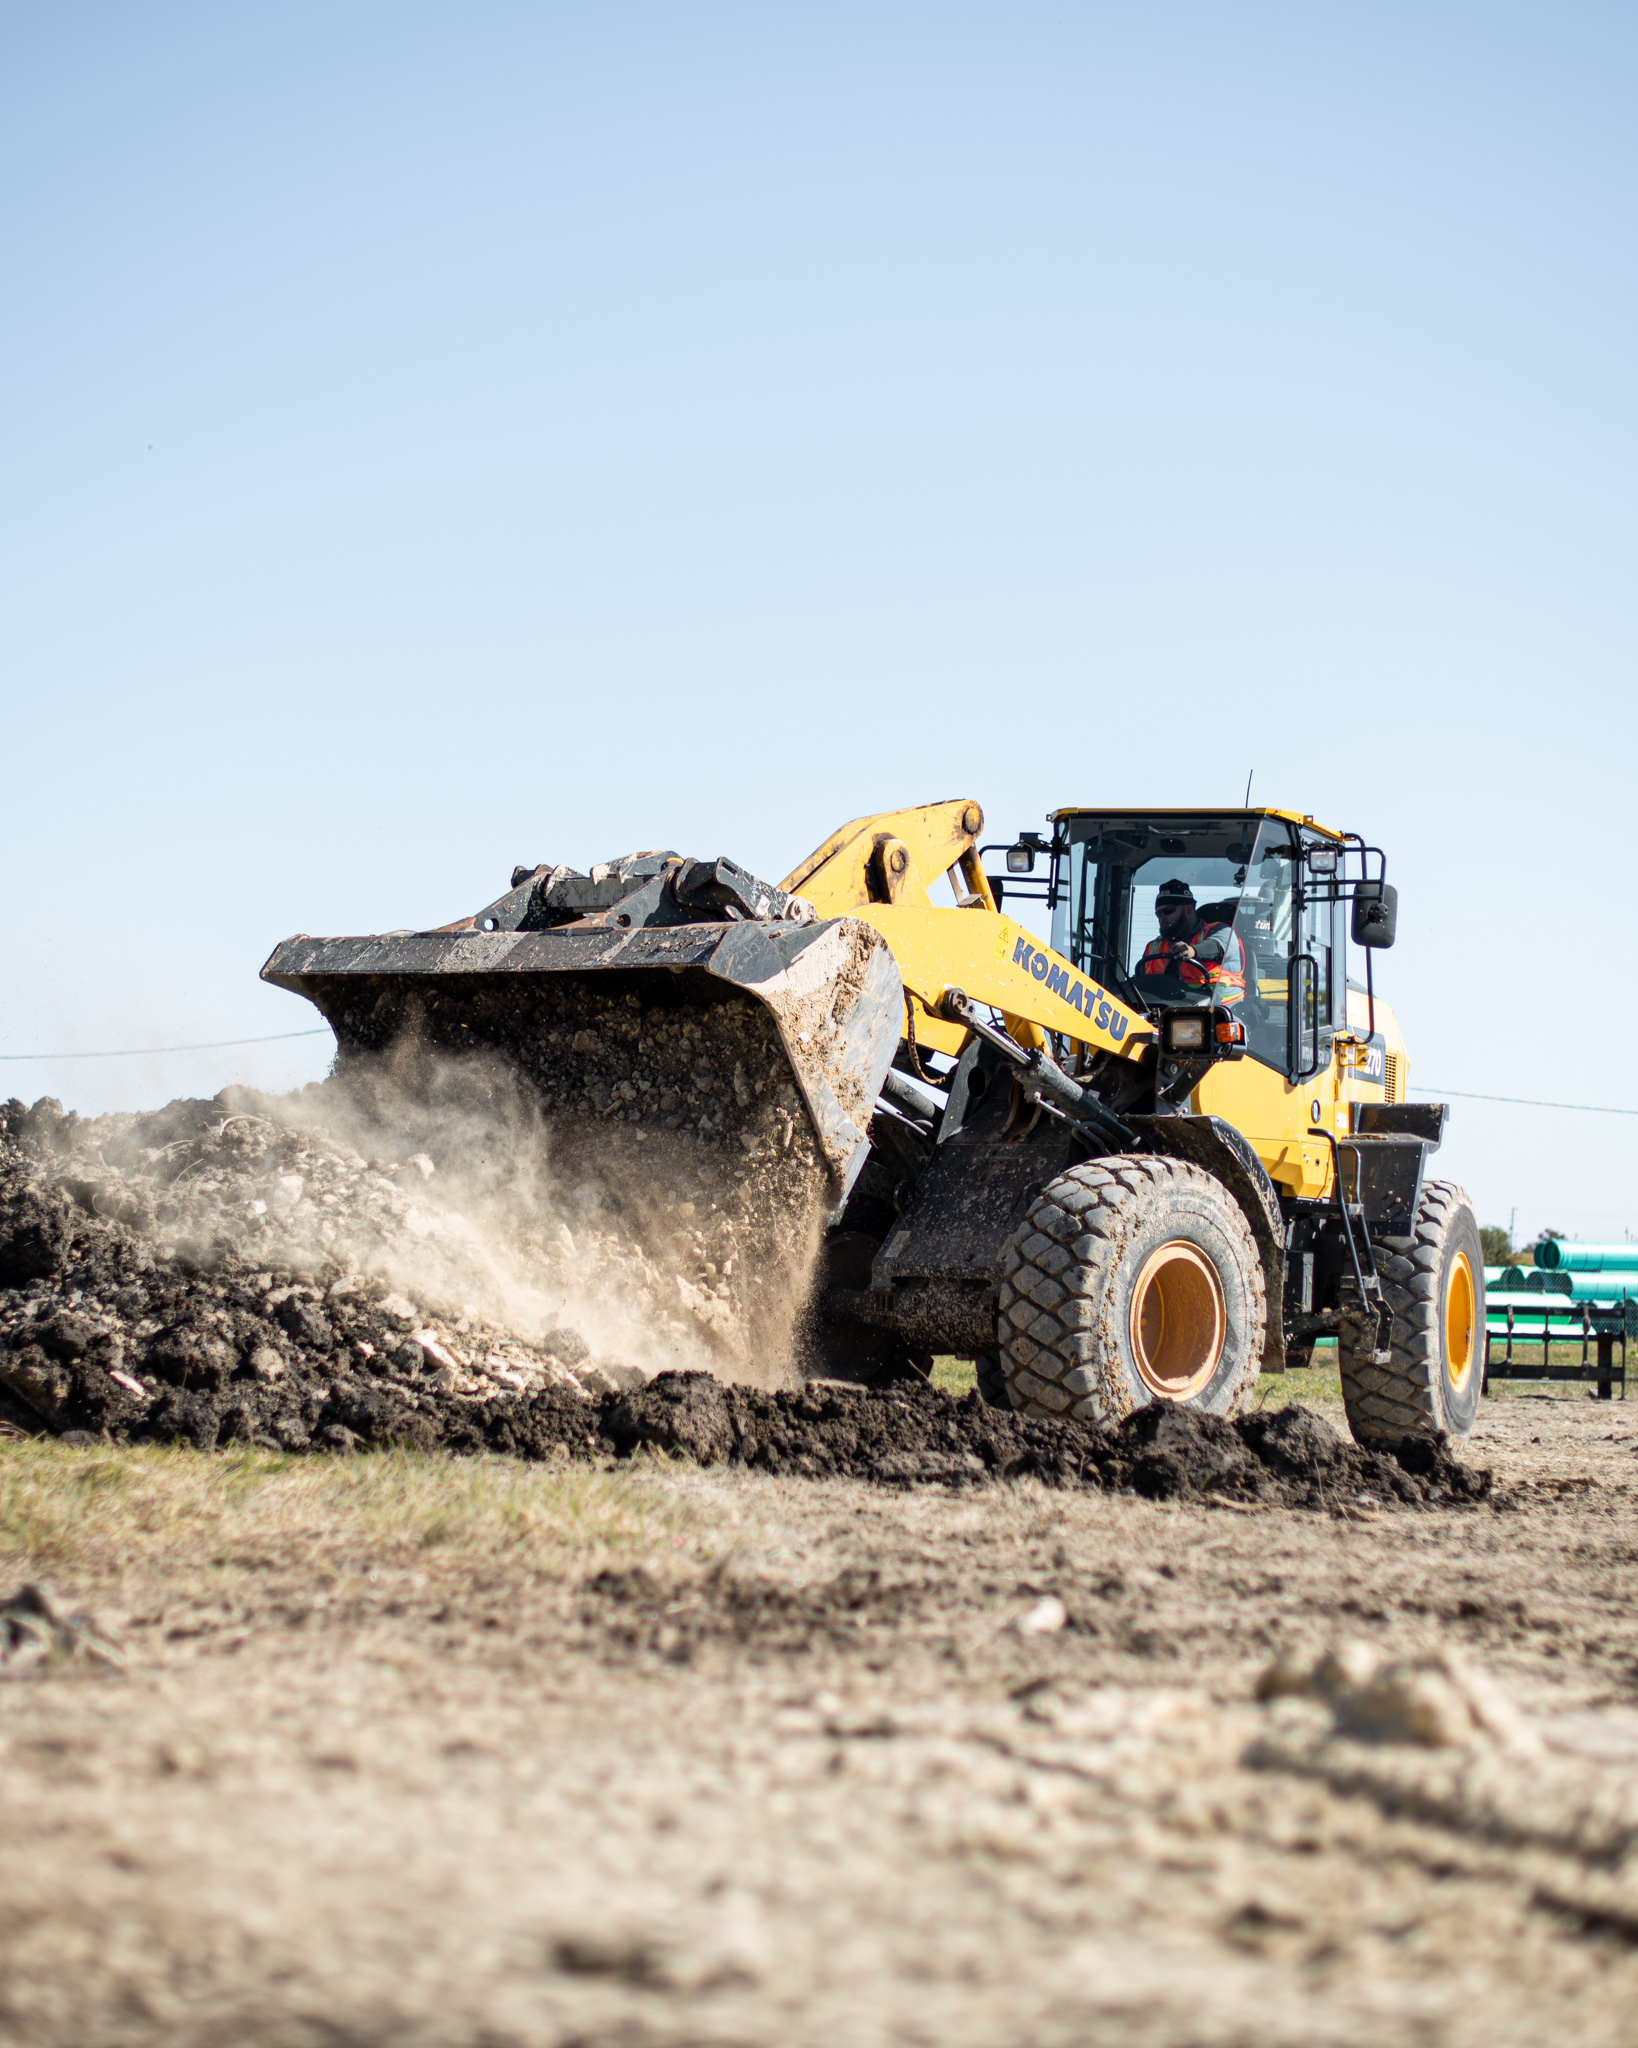 Komatsu wheel loader moving dirt.